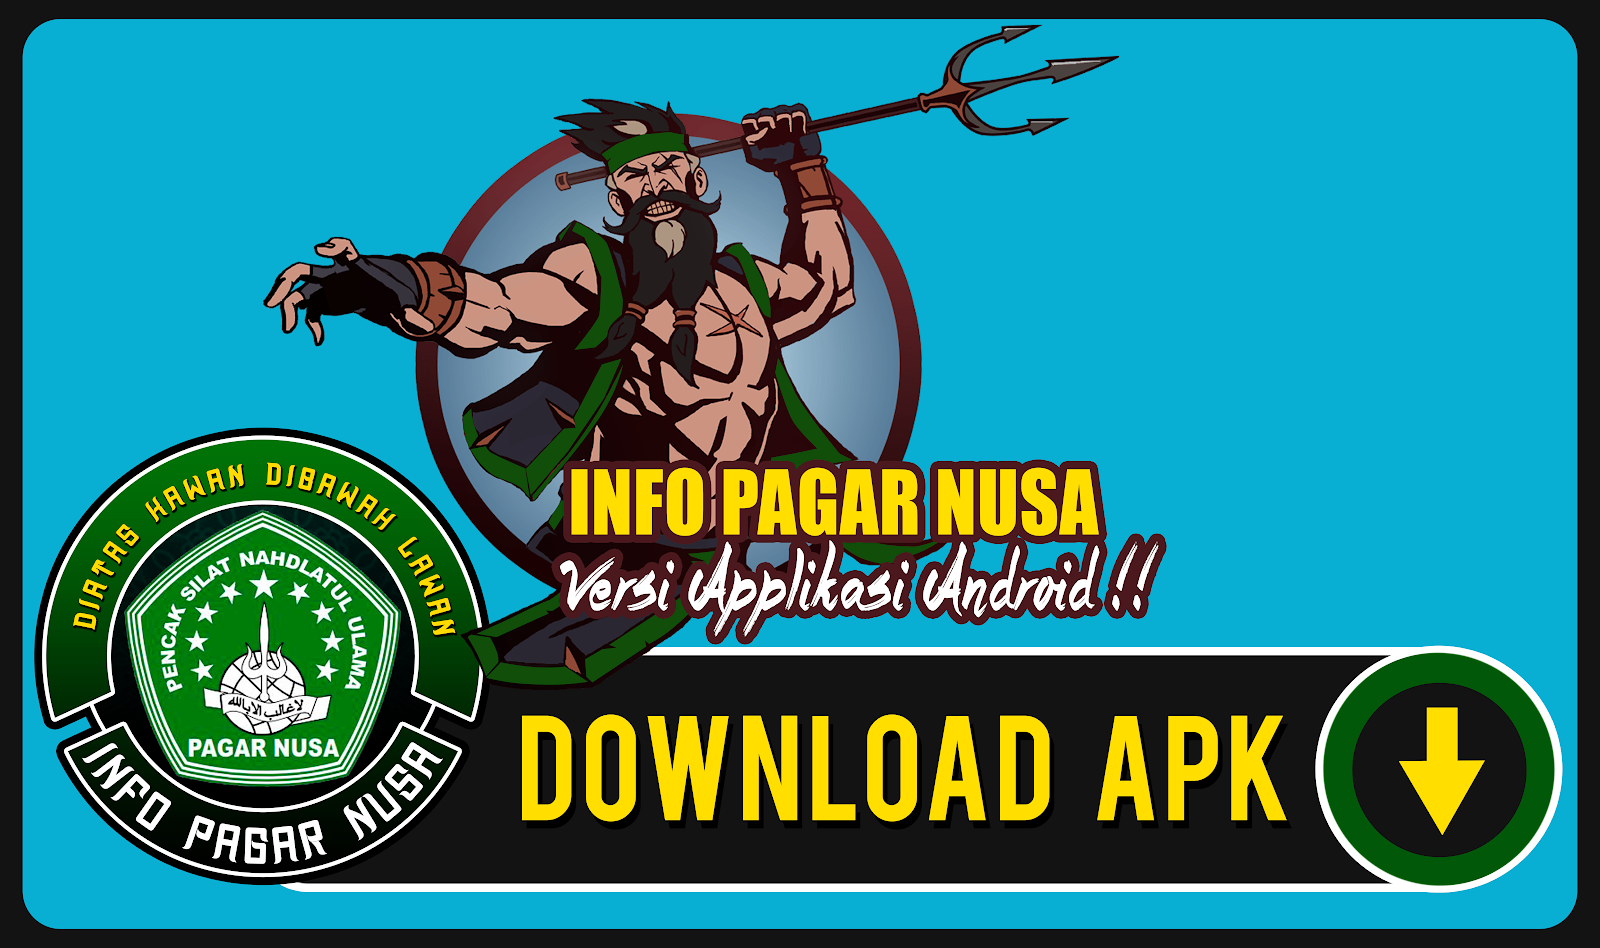 Download APK Info Pagar Nusa